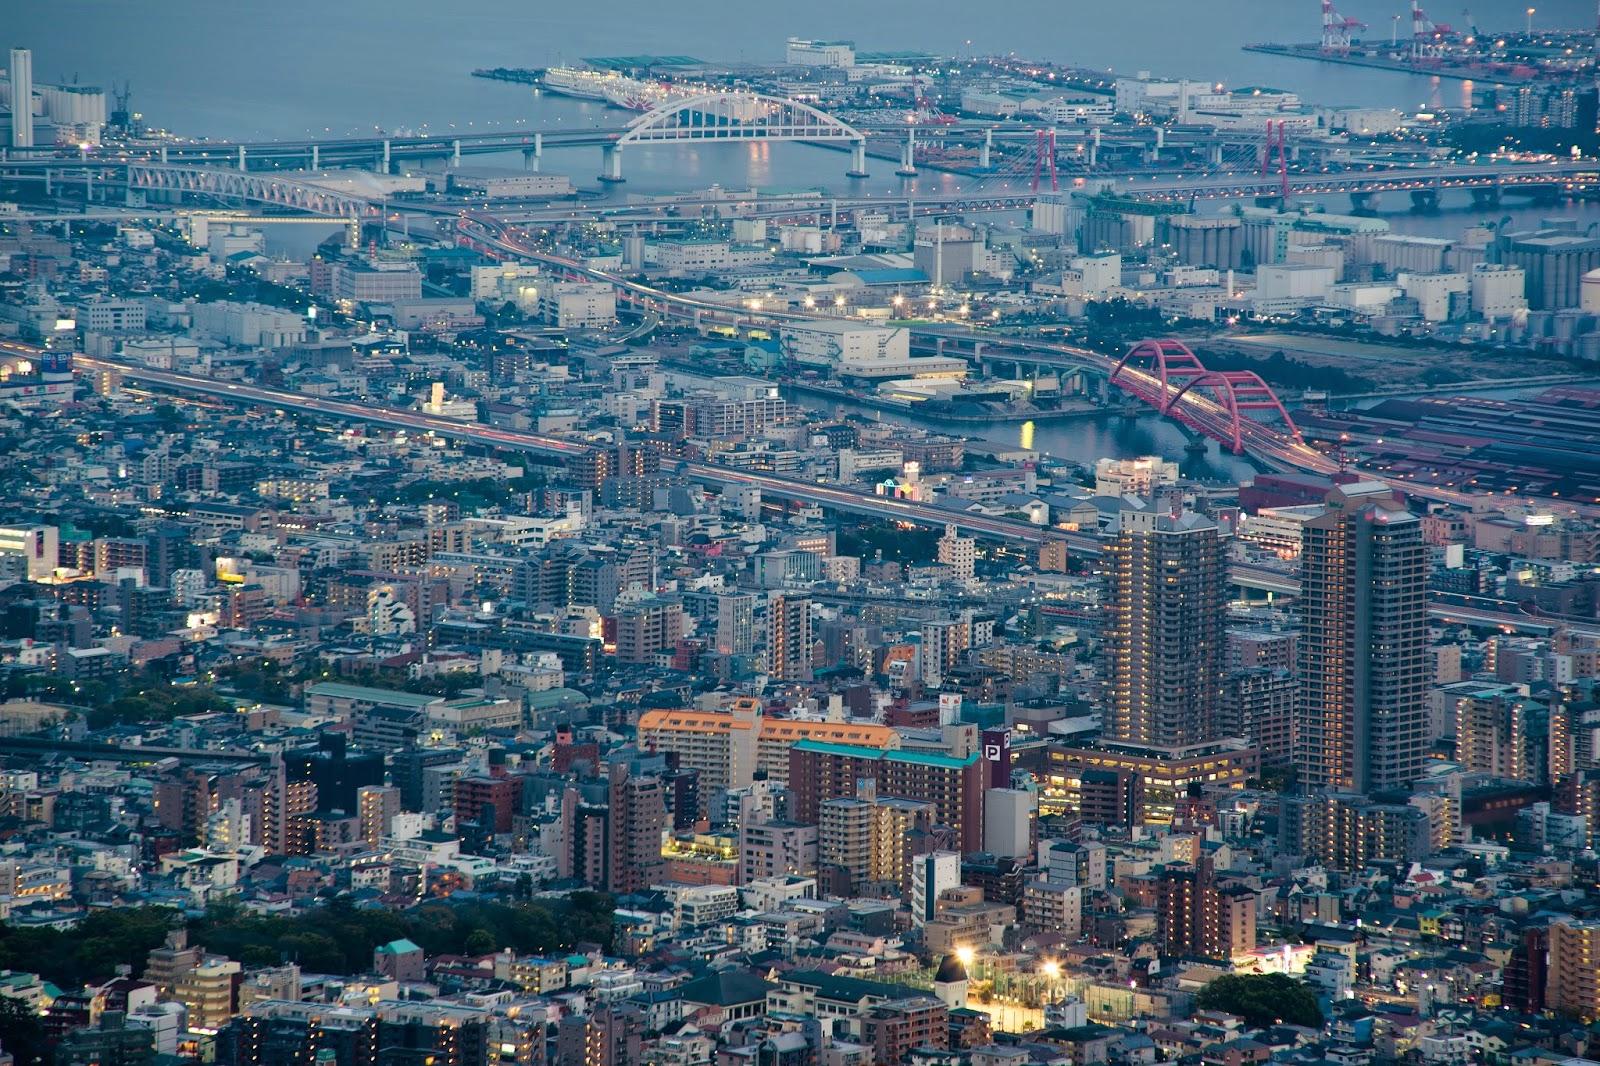 pmyfoto: 京阪神之旅DAY 4 神戶摩耶山夜景 神戶港夜景